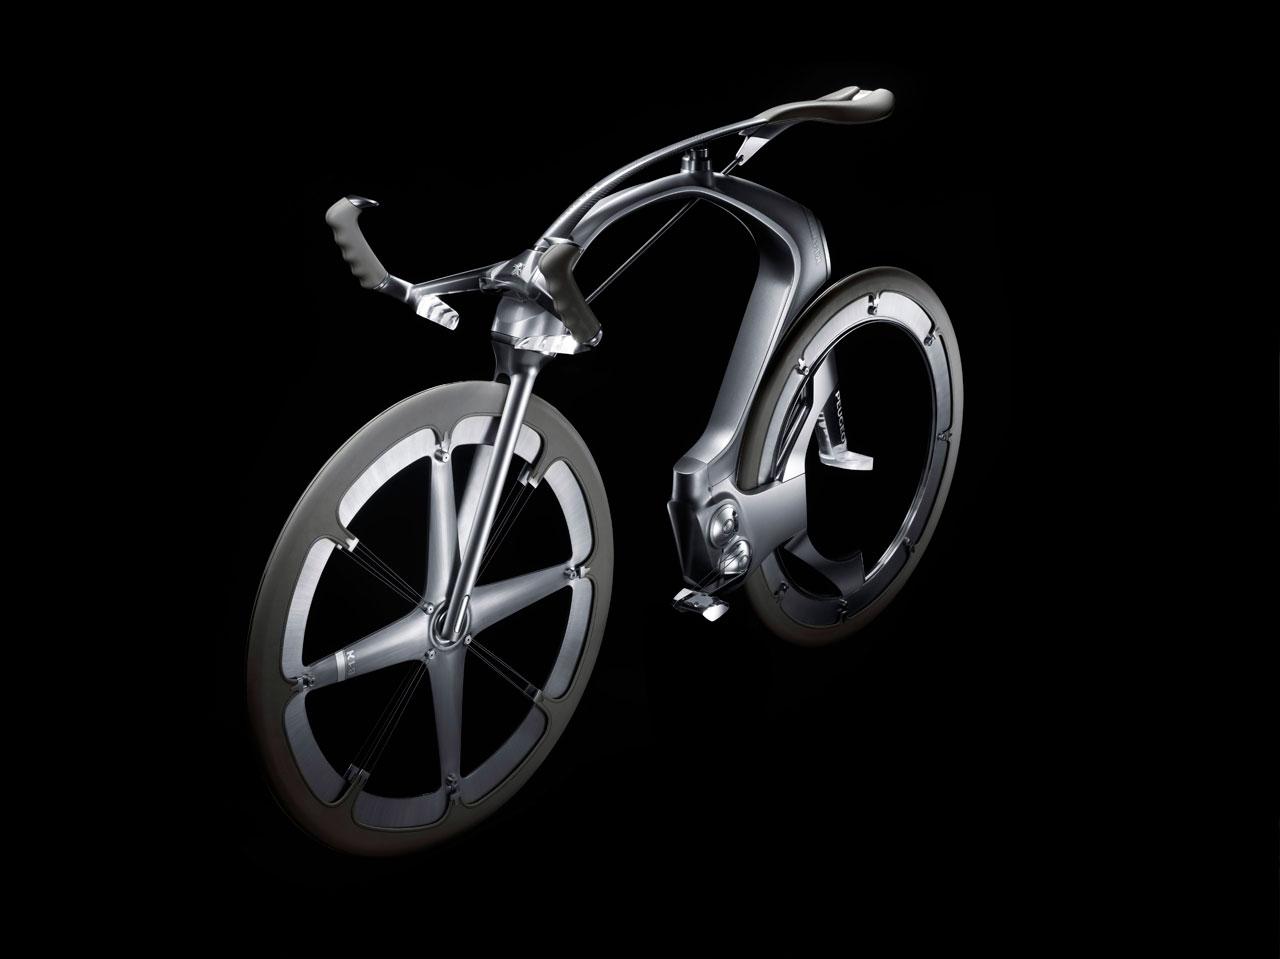 https://i0.wp.com/www.carbodydesign.com/archive/2010/02/peugeot-b1k-bike-concept/Peugeot-B1K-Bike-Concept-2-lg.jpg